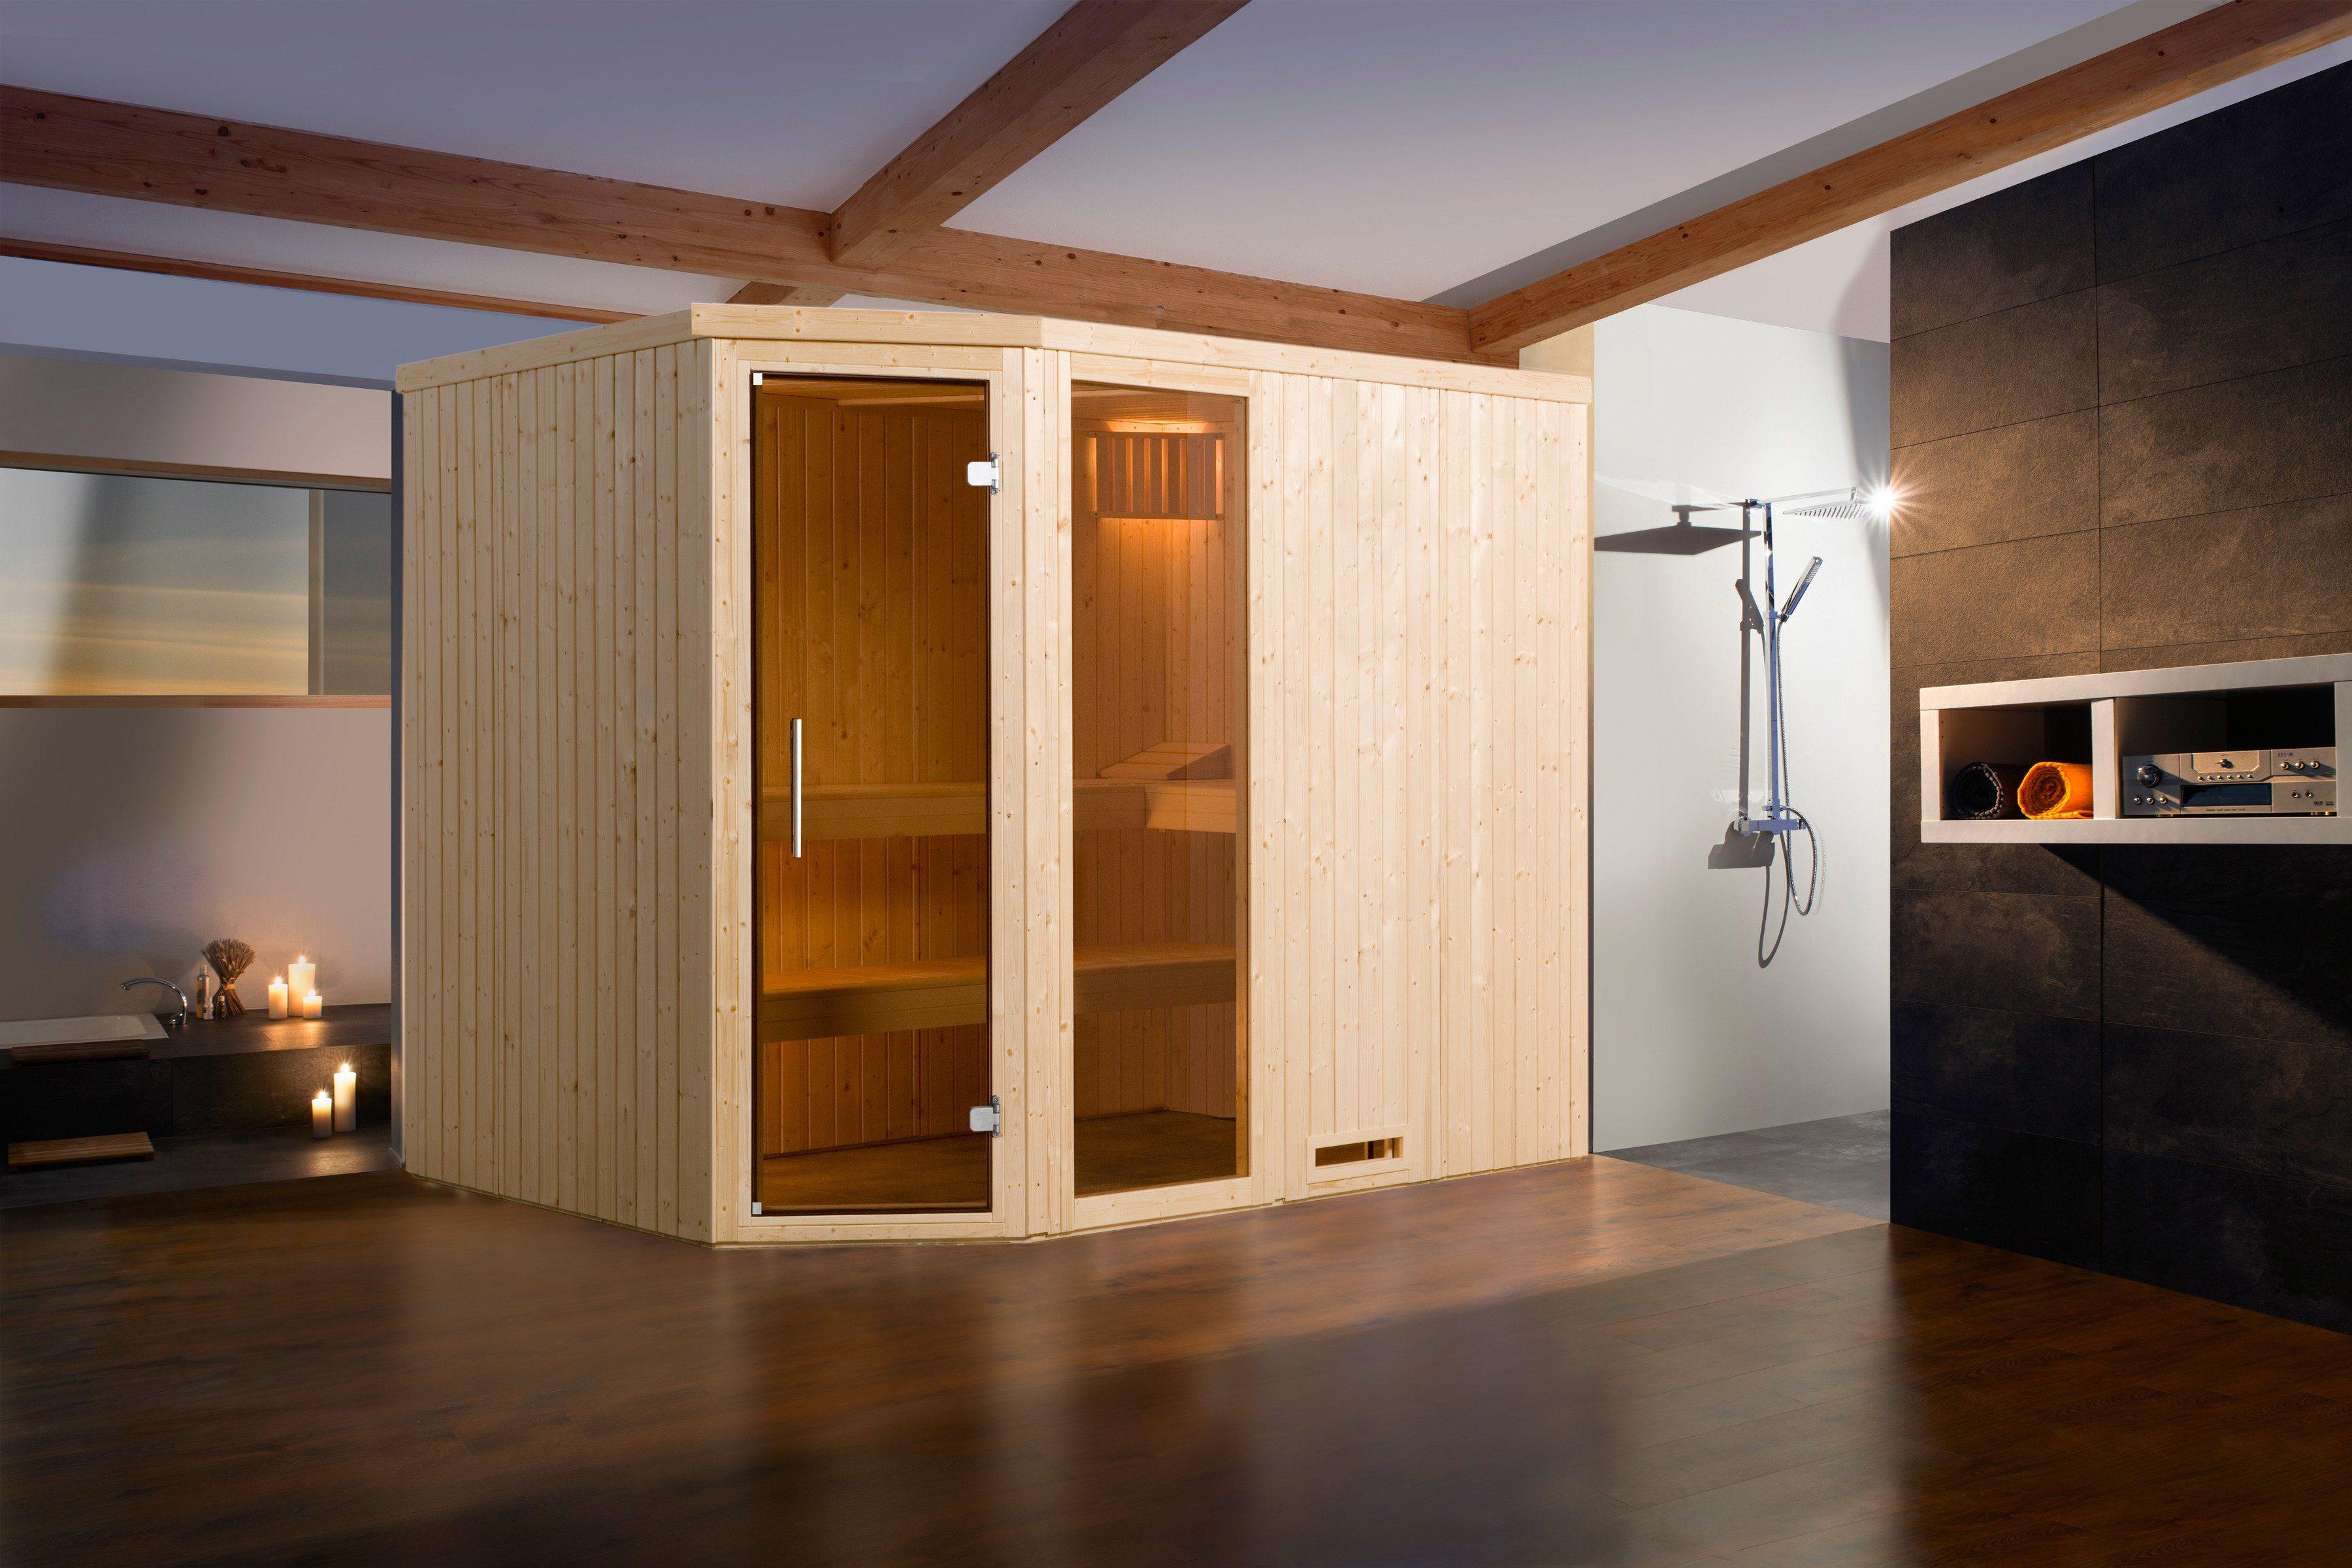 Weka Sauna »Lyngdal 4 Trend Plus Kompakt«, 242/192/201 cm, 68 mm, 8-KW-Ofen